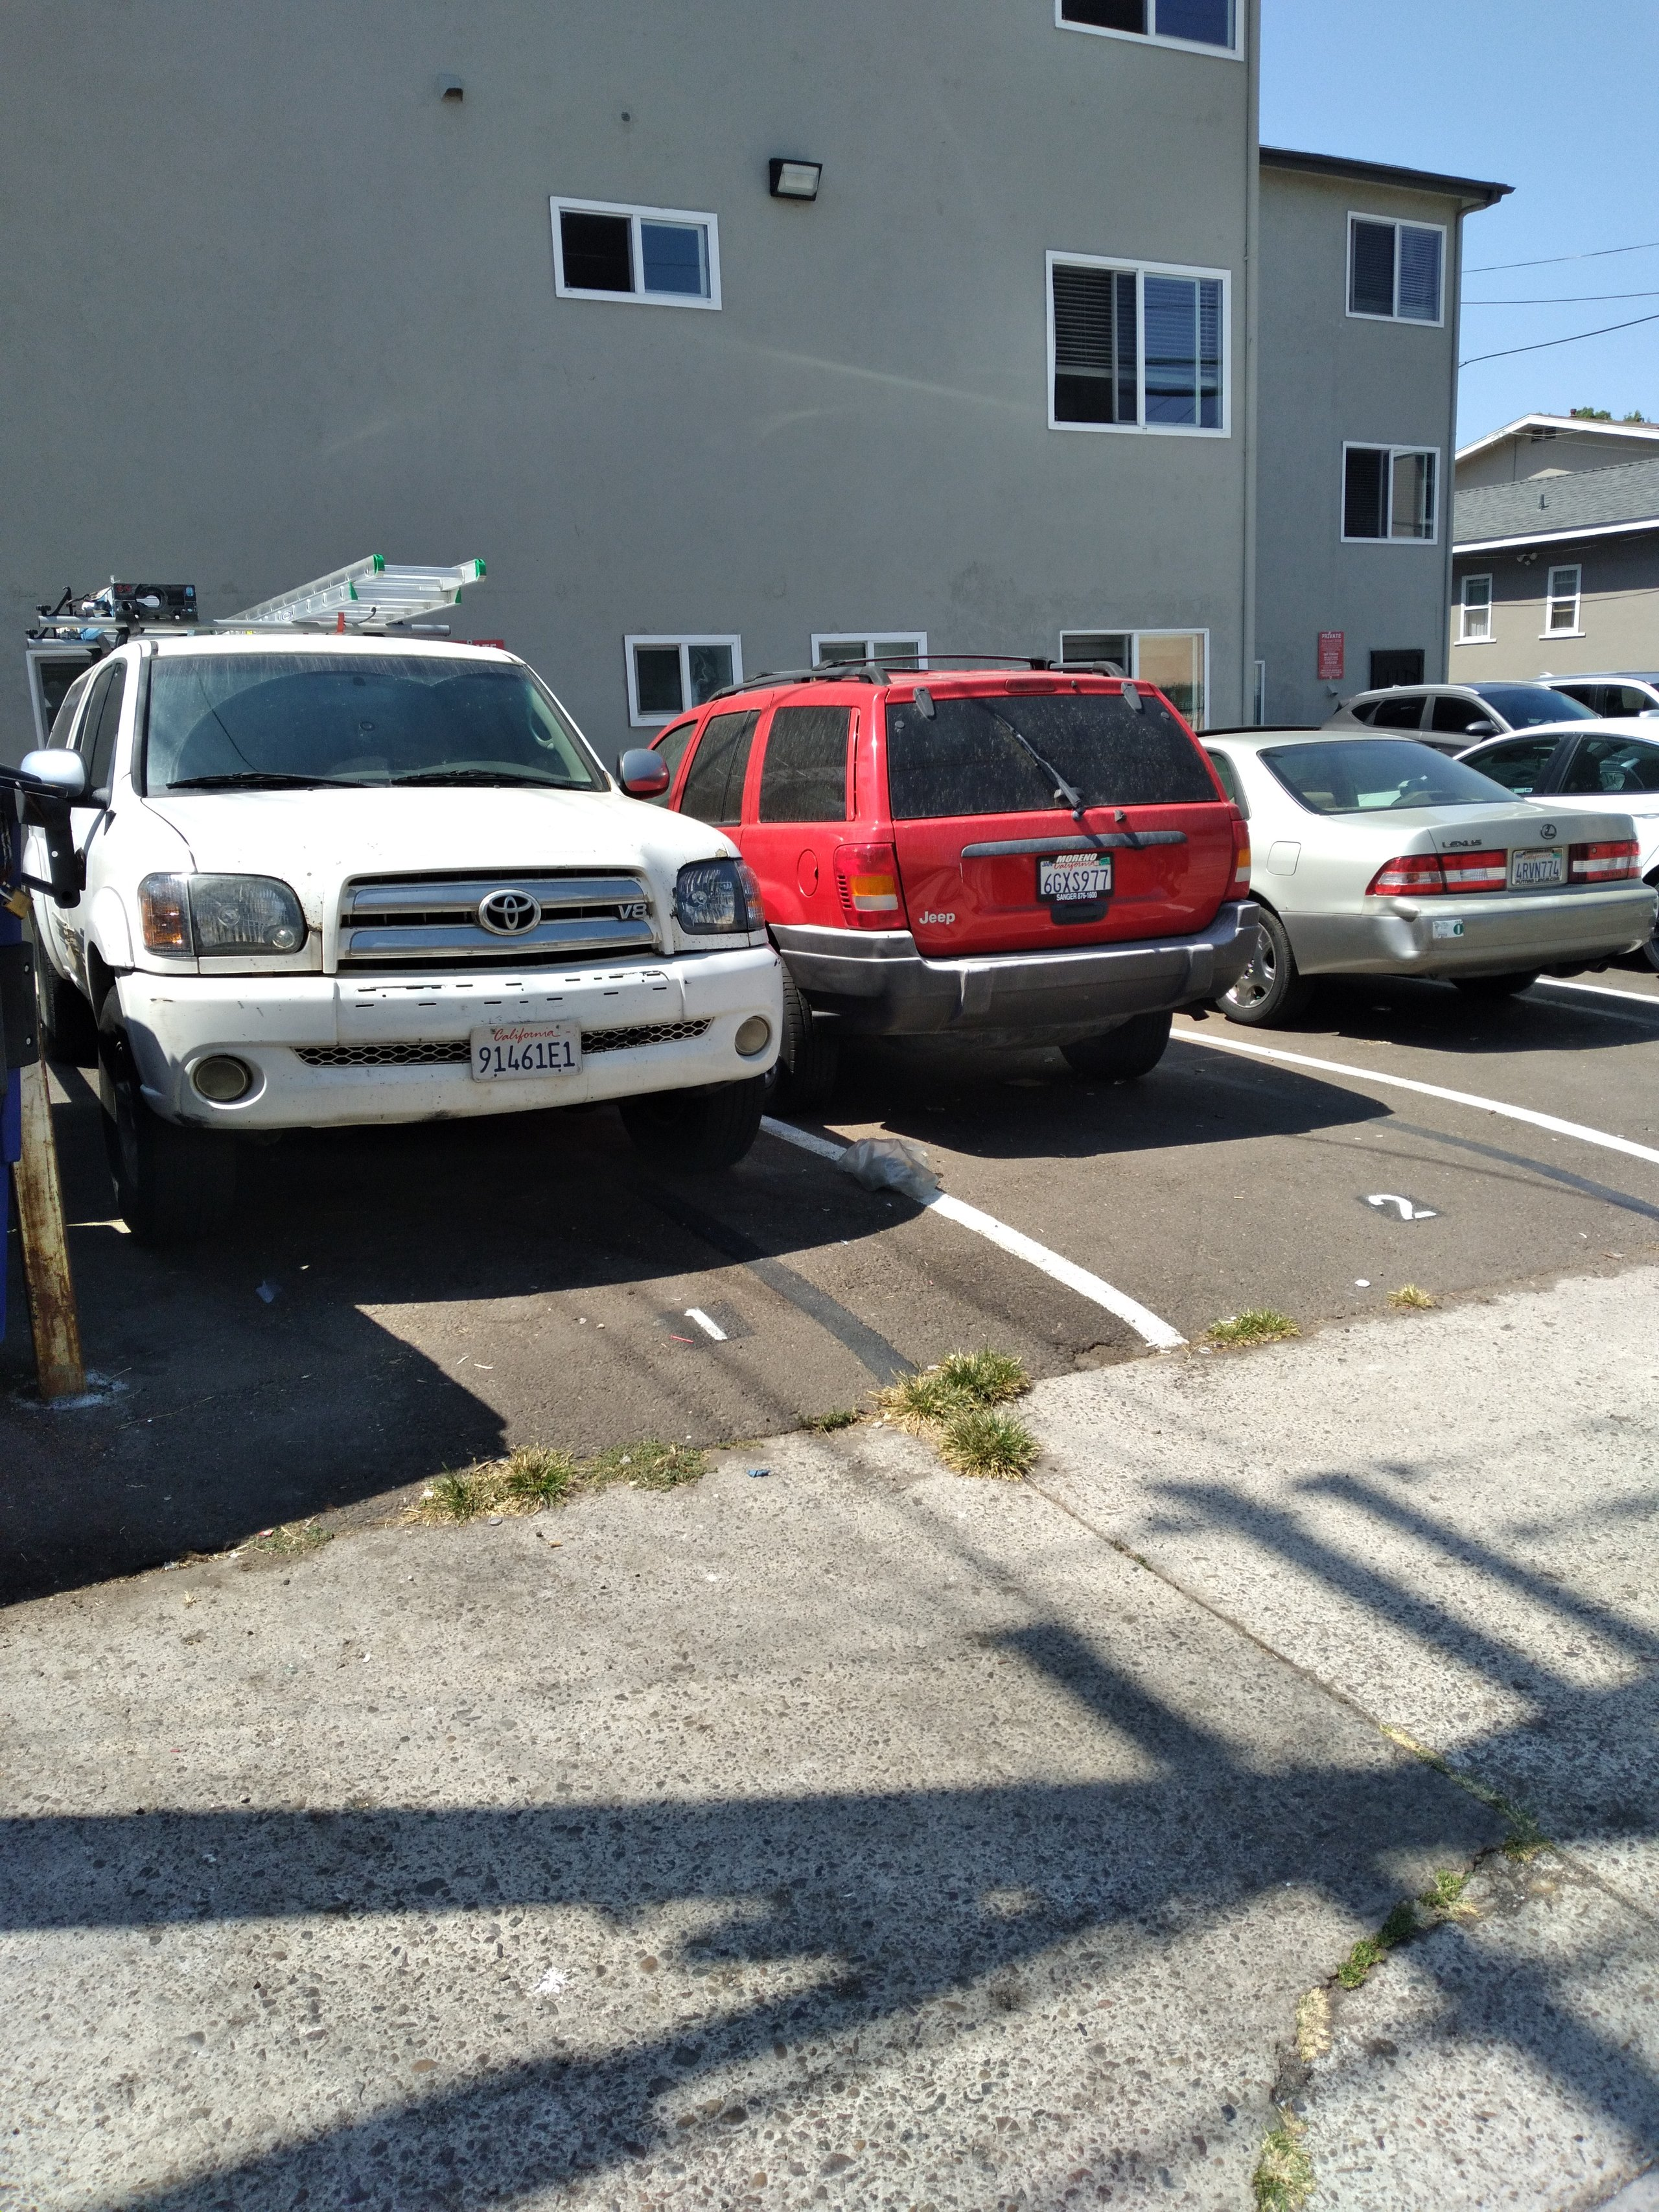 25x12 Parking Lot self storage unit